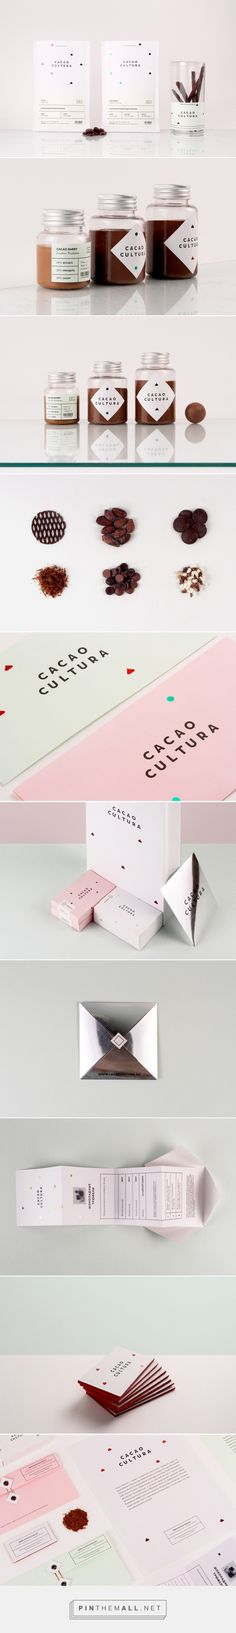 Cacao Cultura Designed by Vladimir Shlygin #packaging #branding #identity